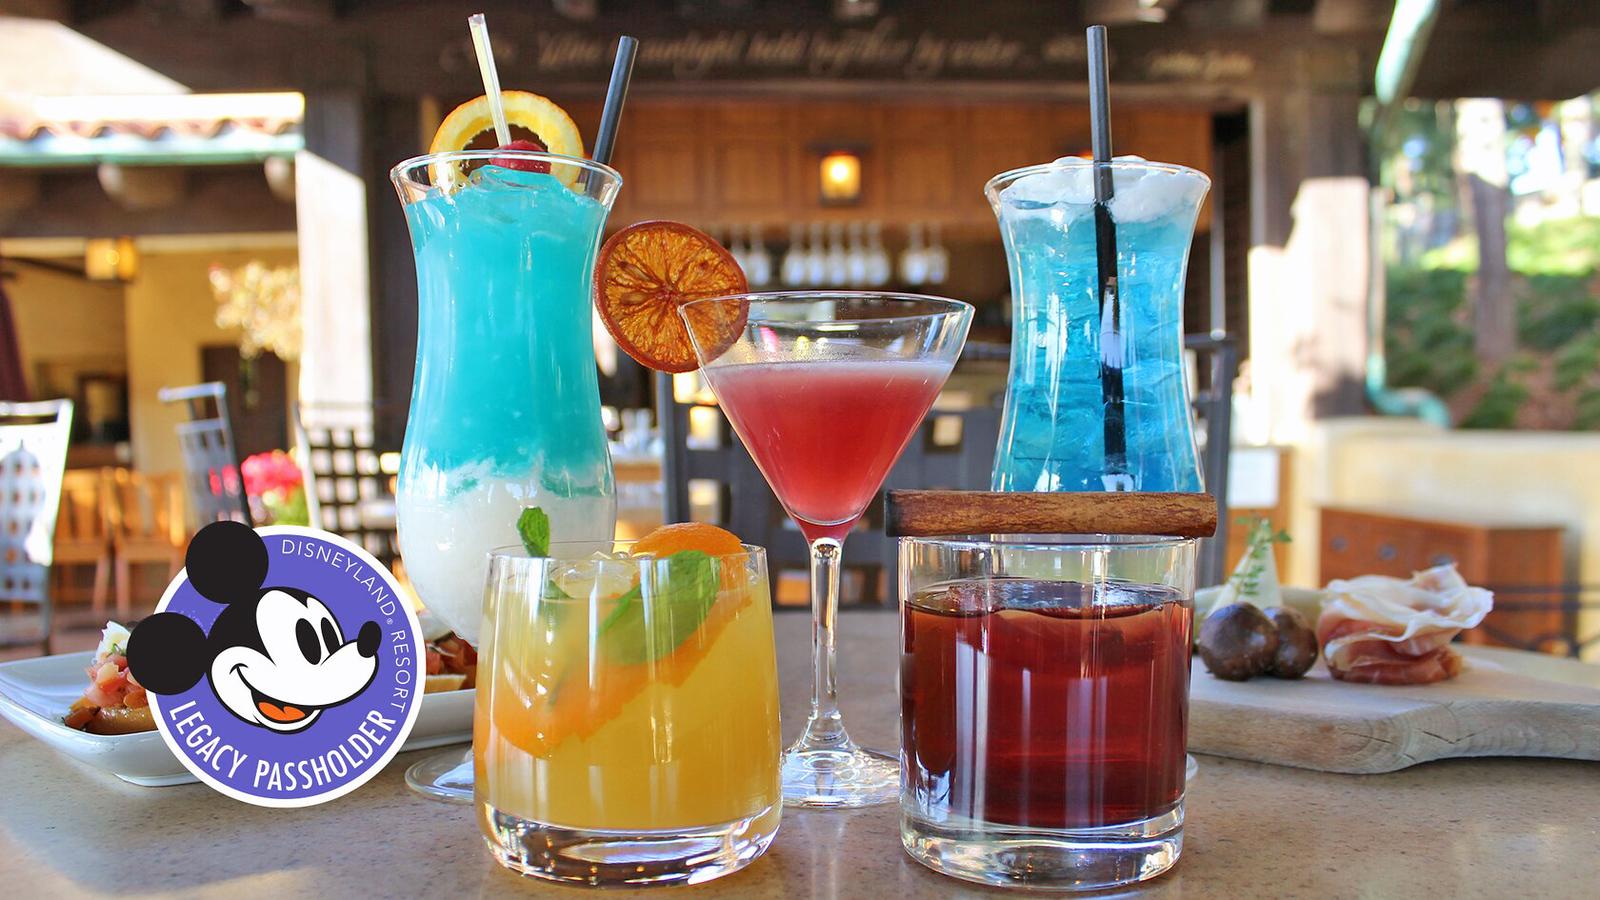 alfresco-terrace-experience-drinks-legacy-passholder